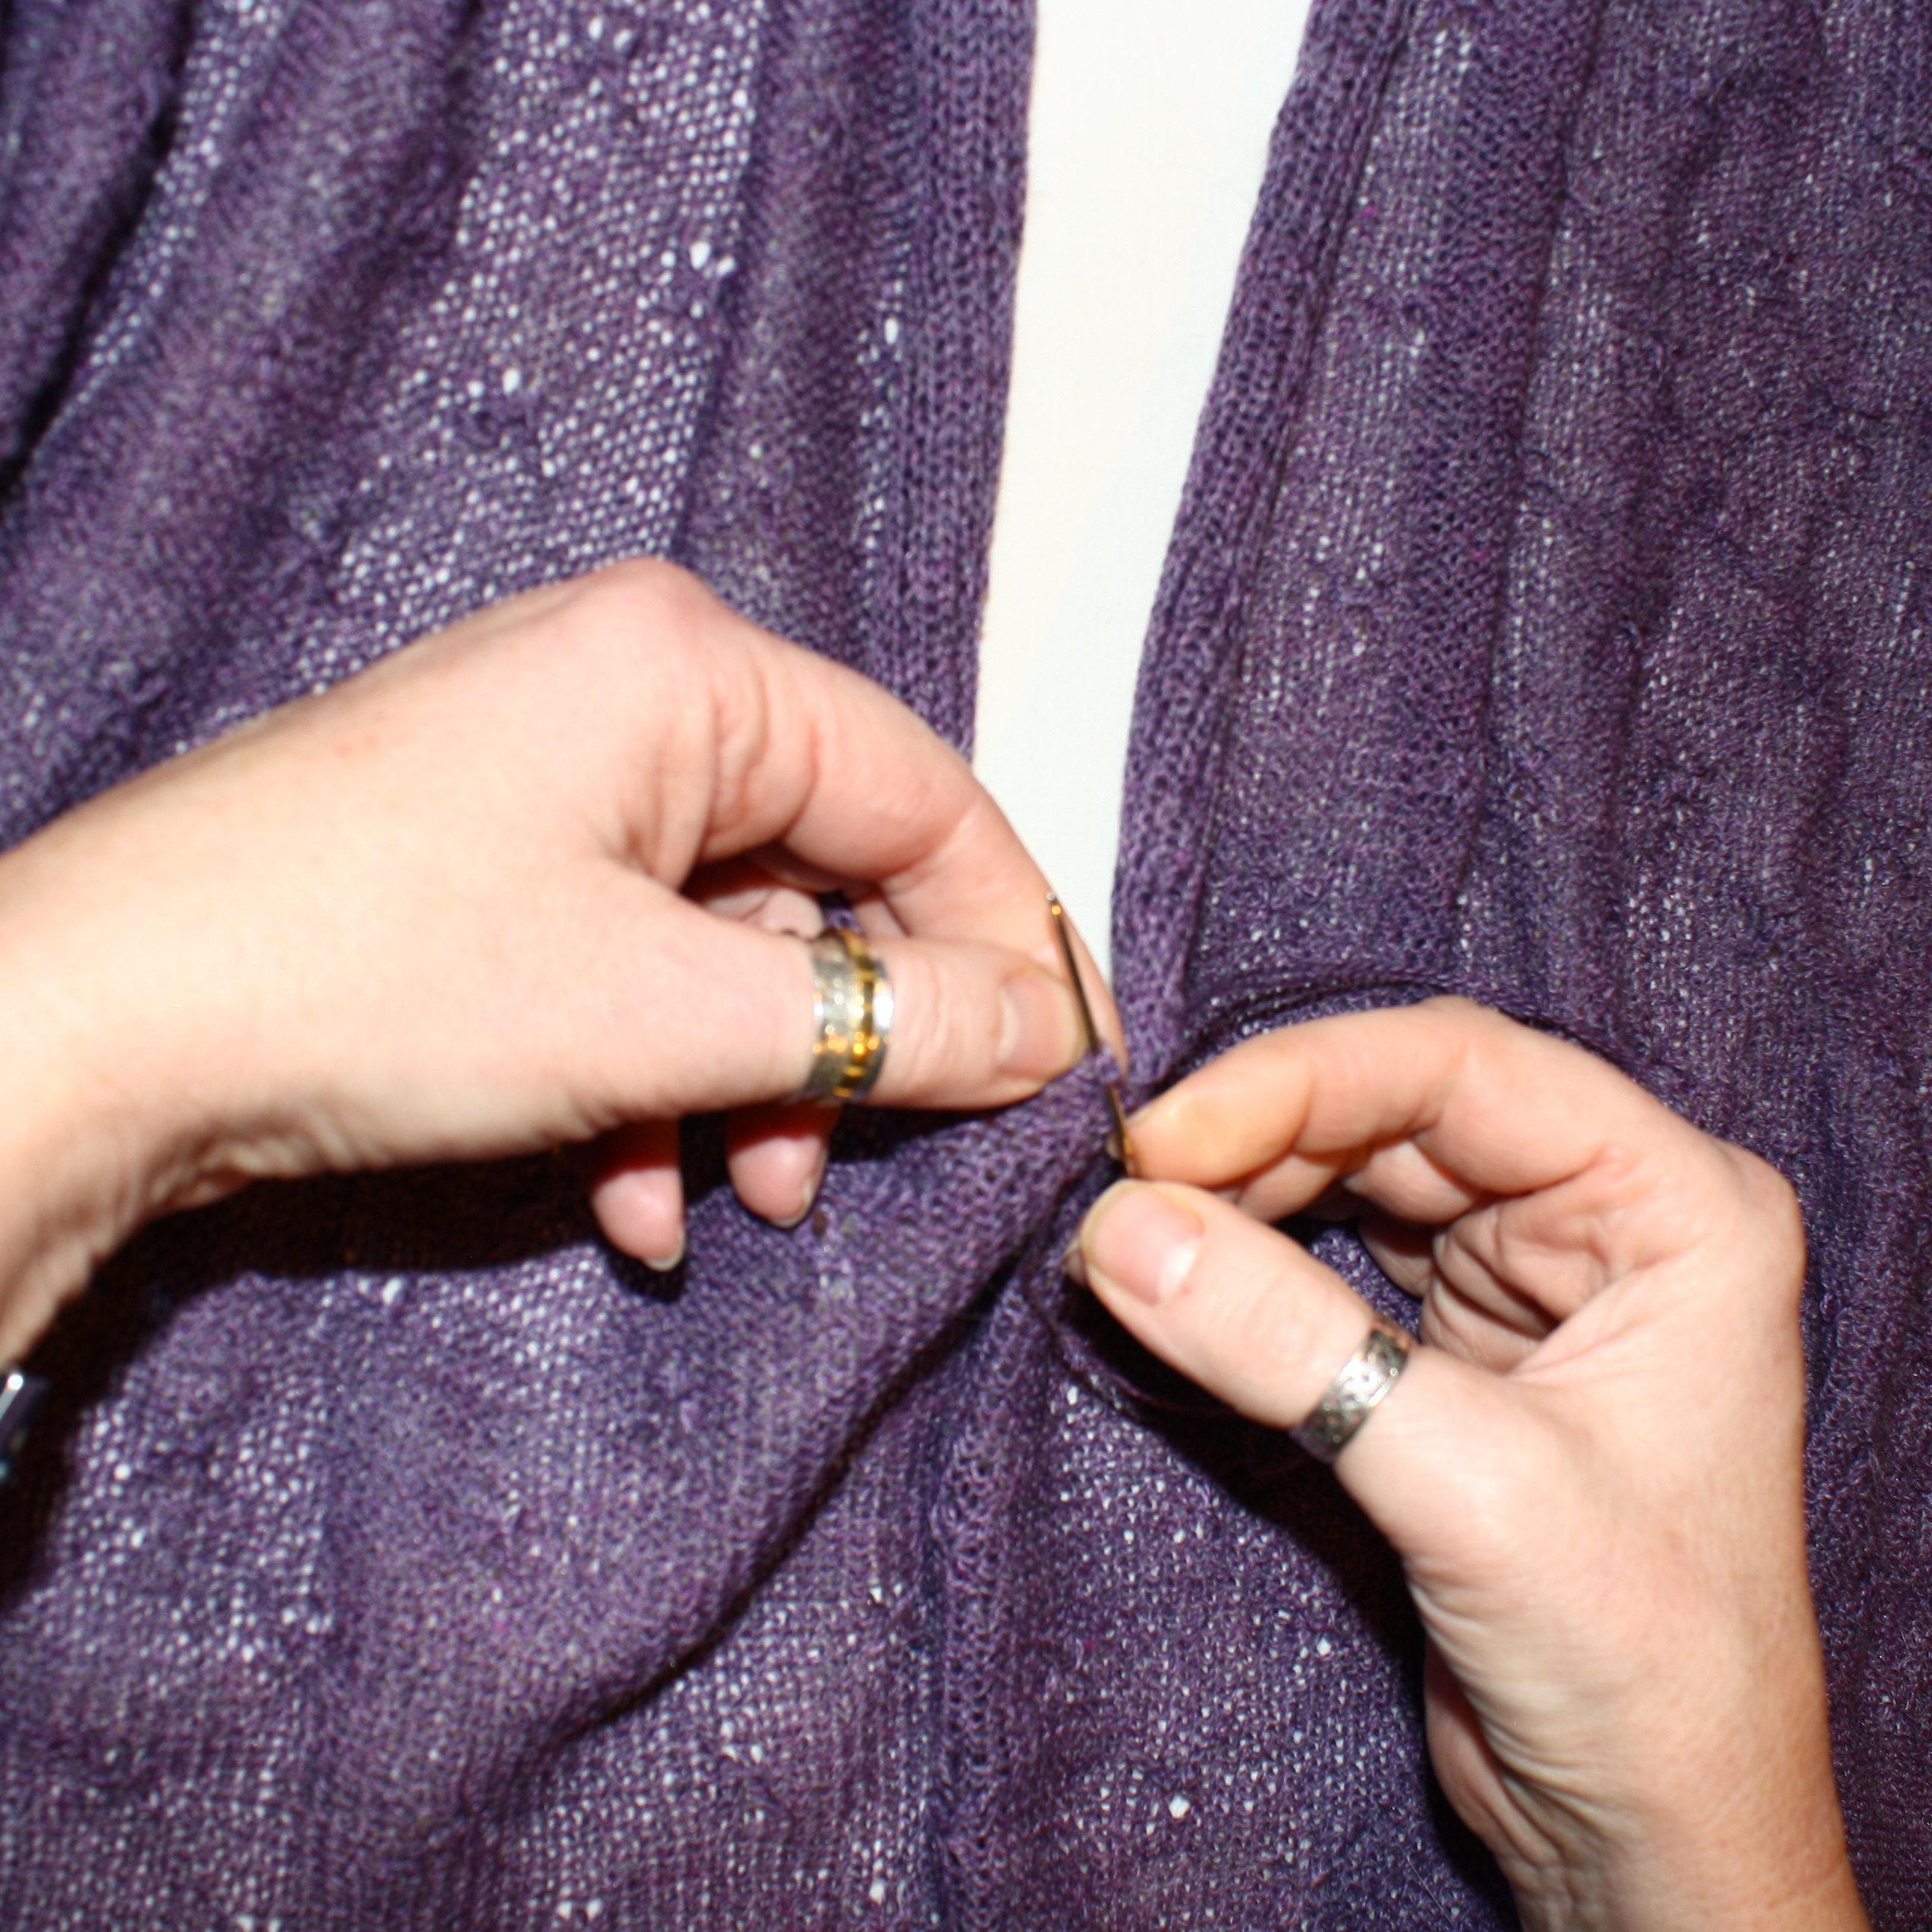 Popular fashion nails uxbridge - Popular Fashion Nails Uxbridge 51